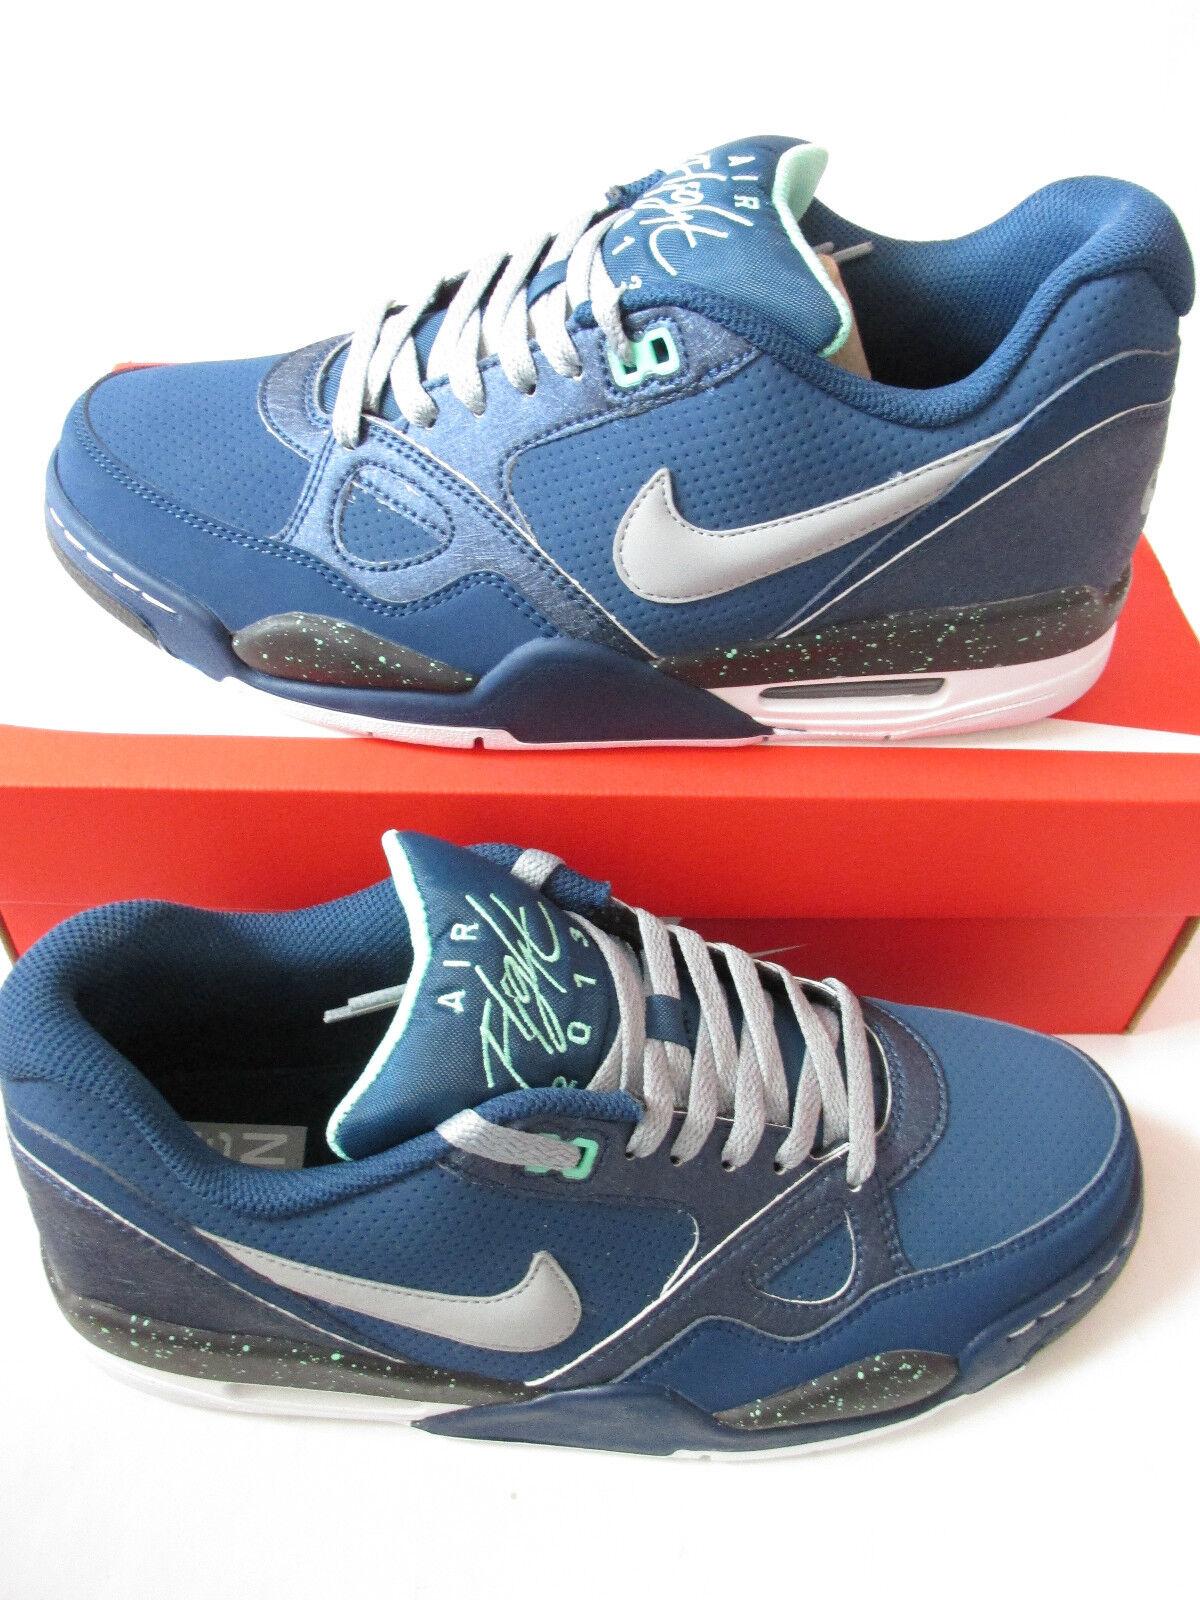 Nike Flight Turnschuhe 13 Herren Turnschuhe 599467 400 Turnschuhe Flight e71526